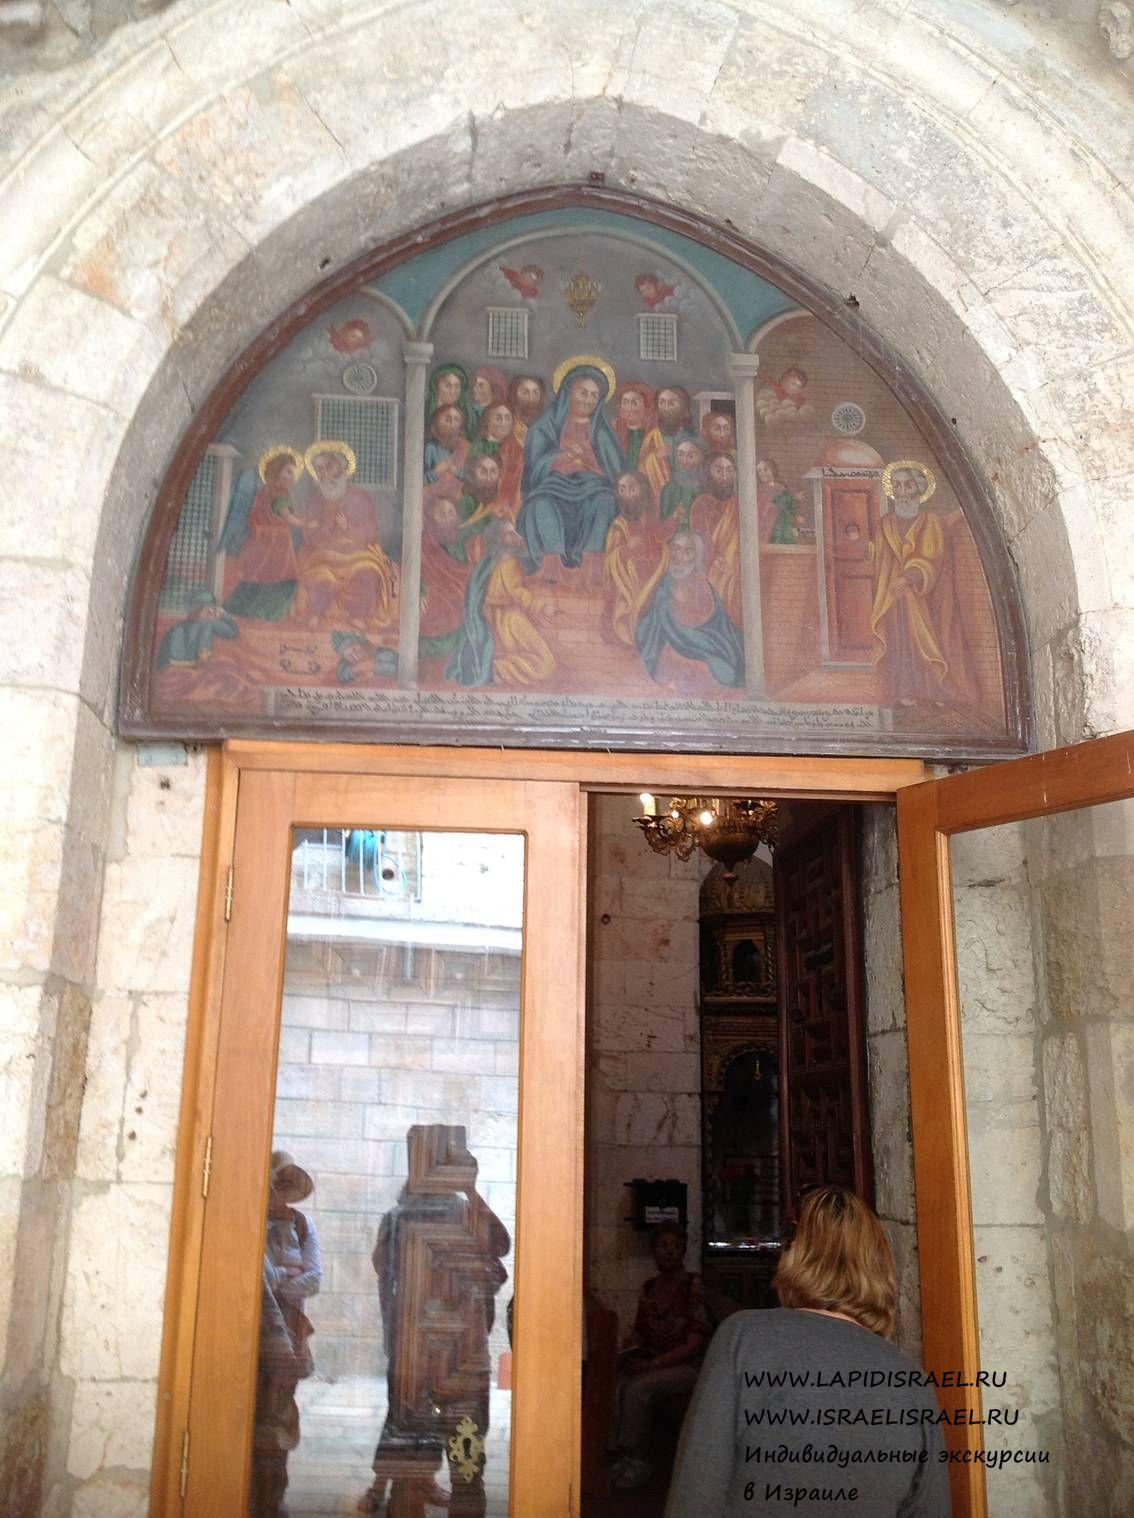 ancient Assyrian church in Jerusalem